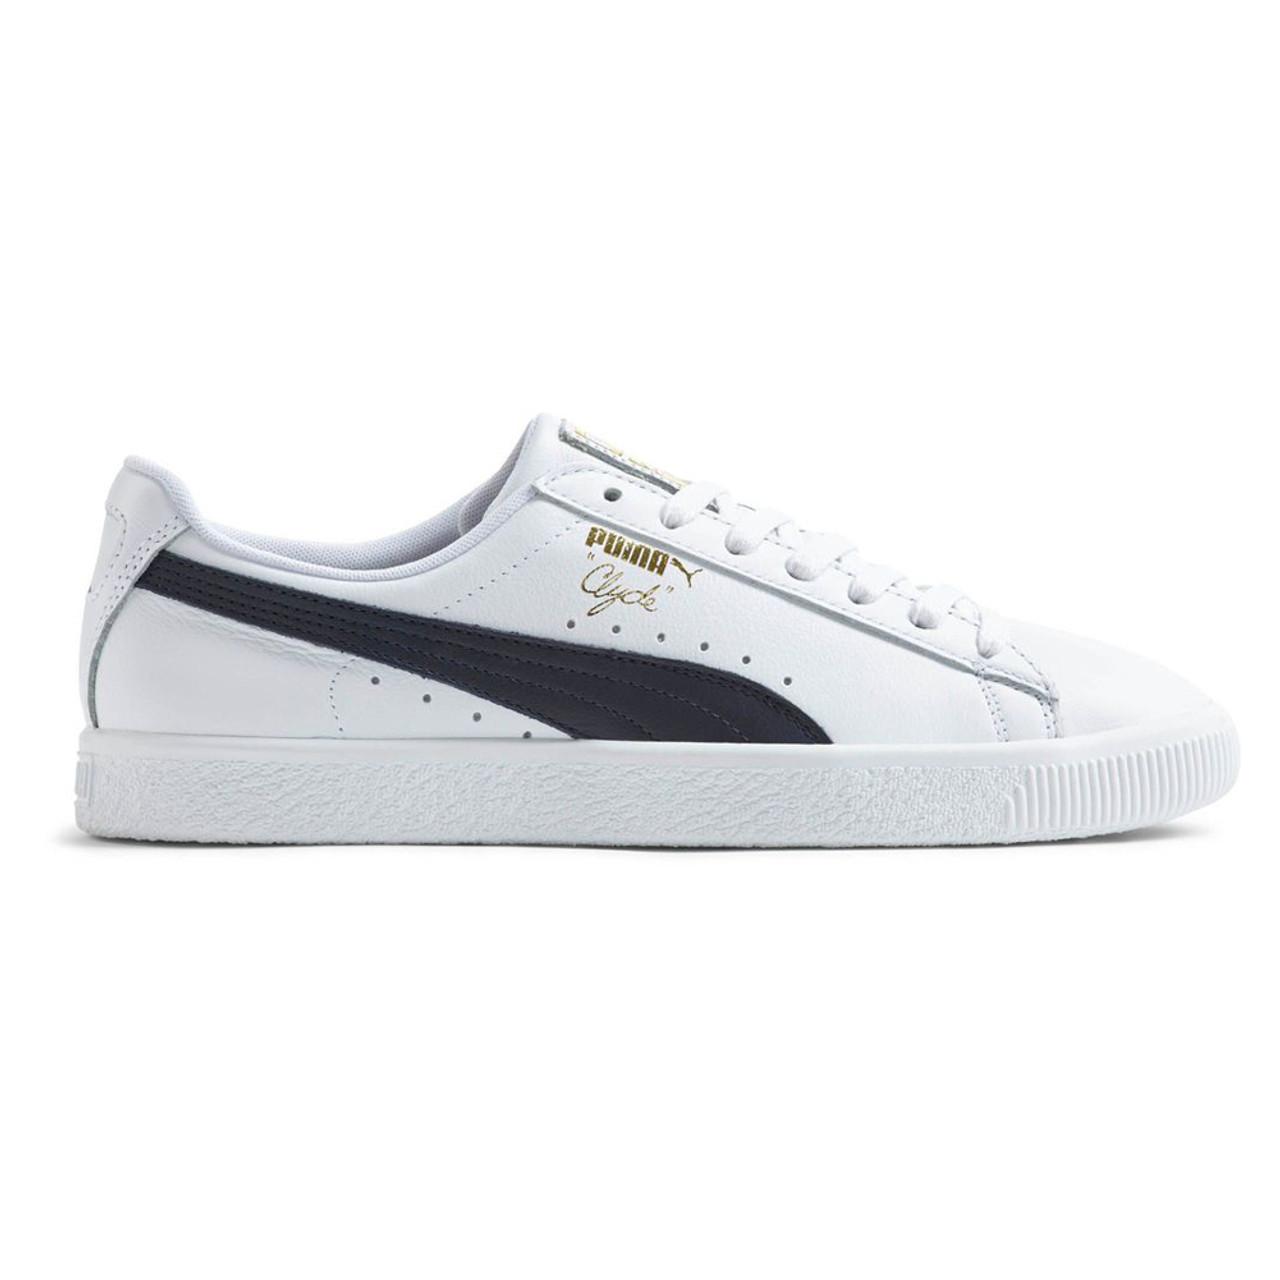 a7630bec18ac Puma Men s Clyde Core Foil Sneaker White Navy Gold - Shop now   Shoolu